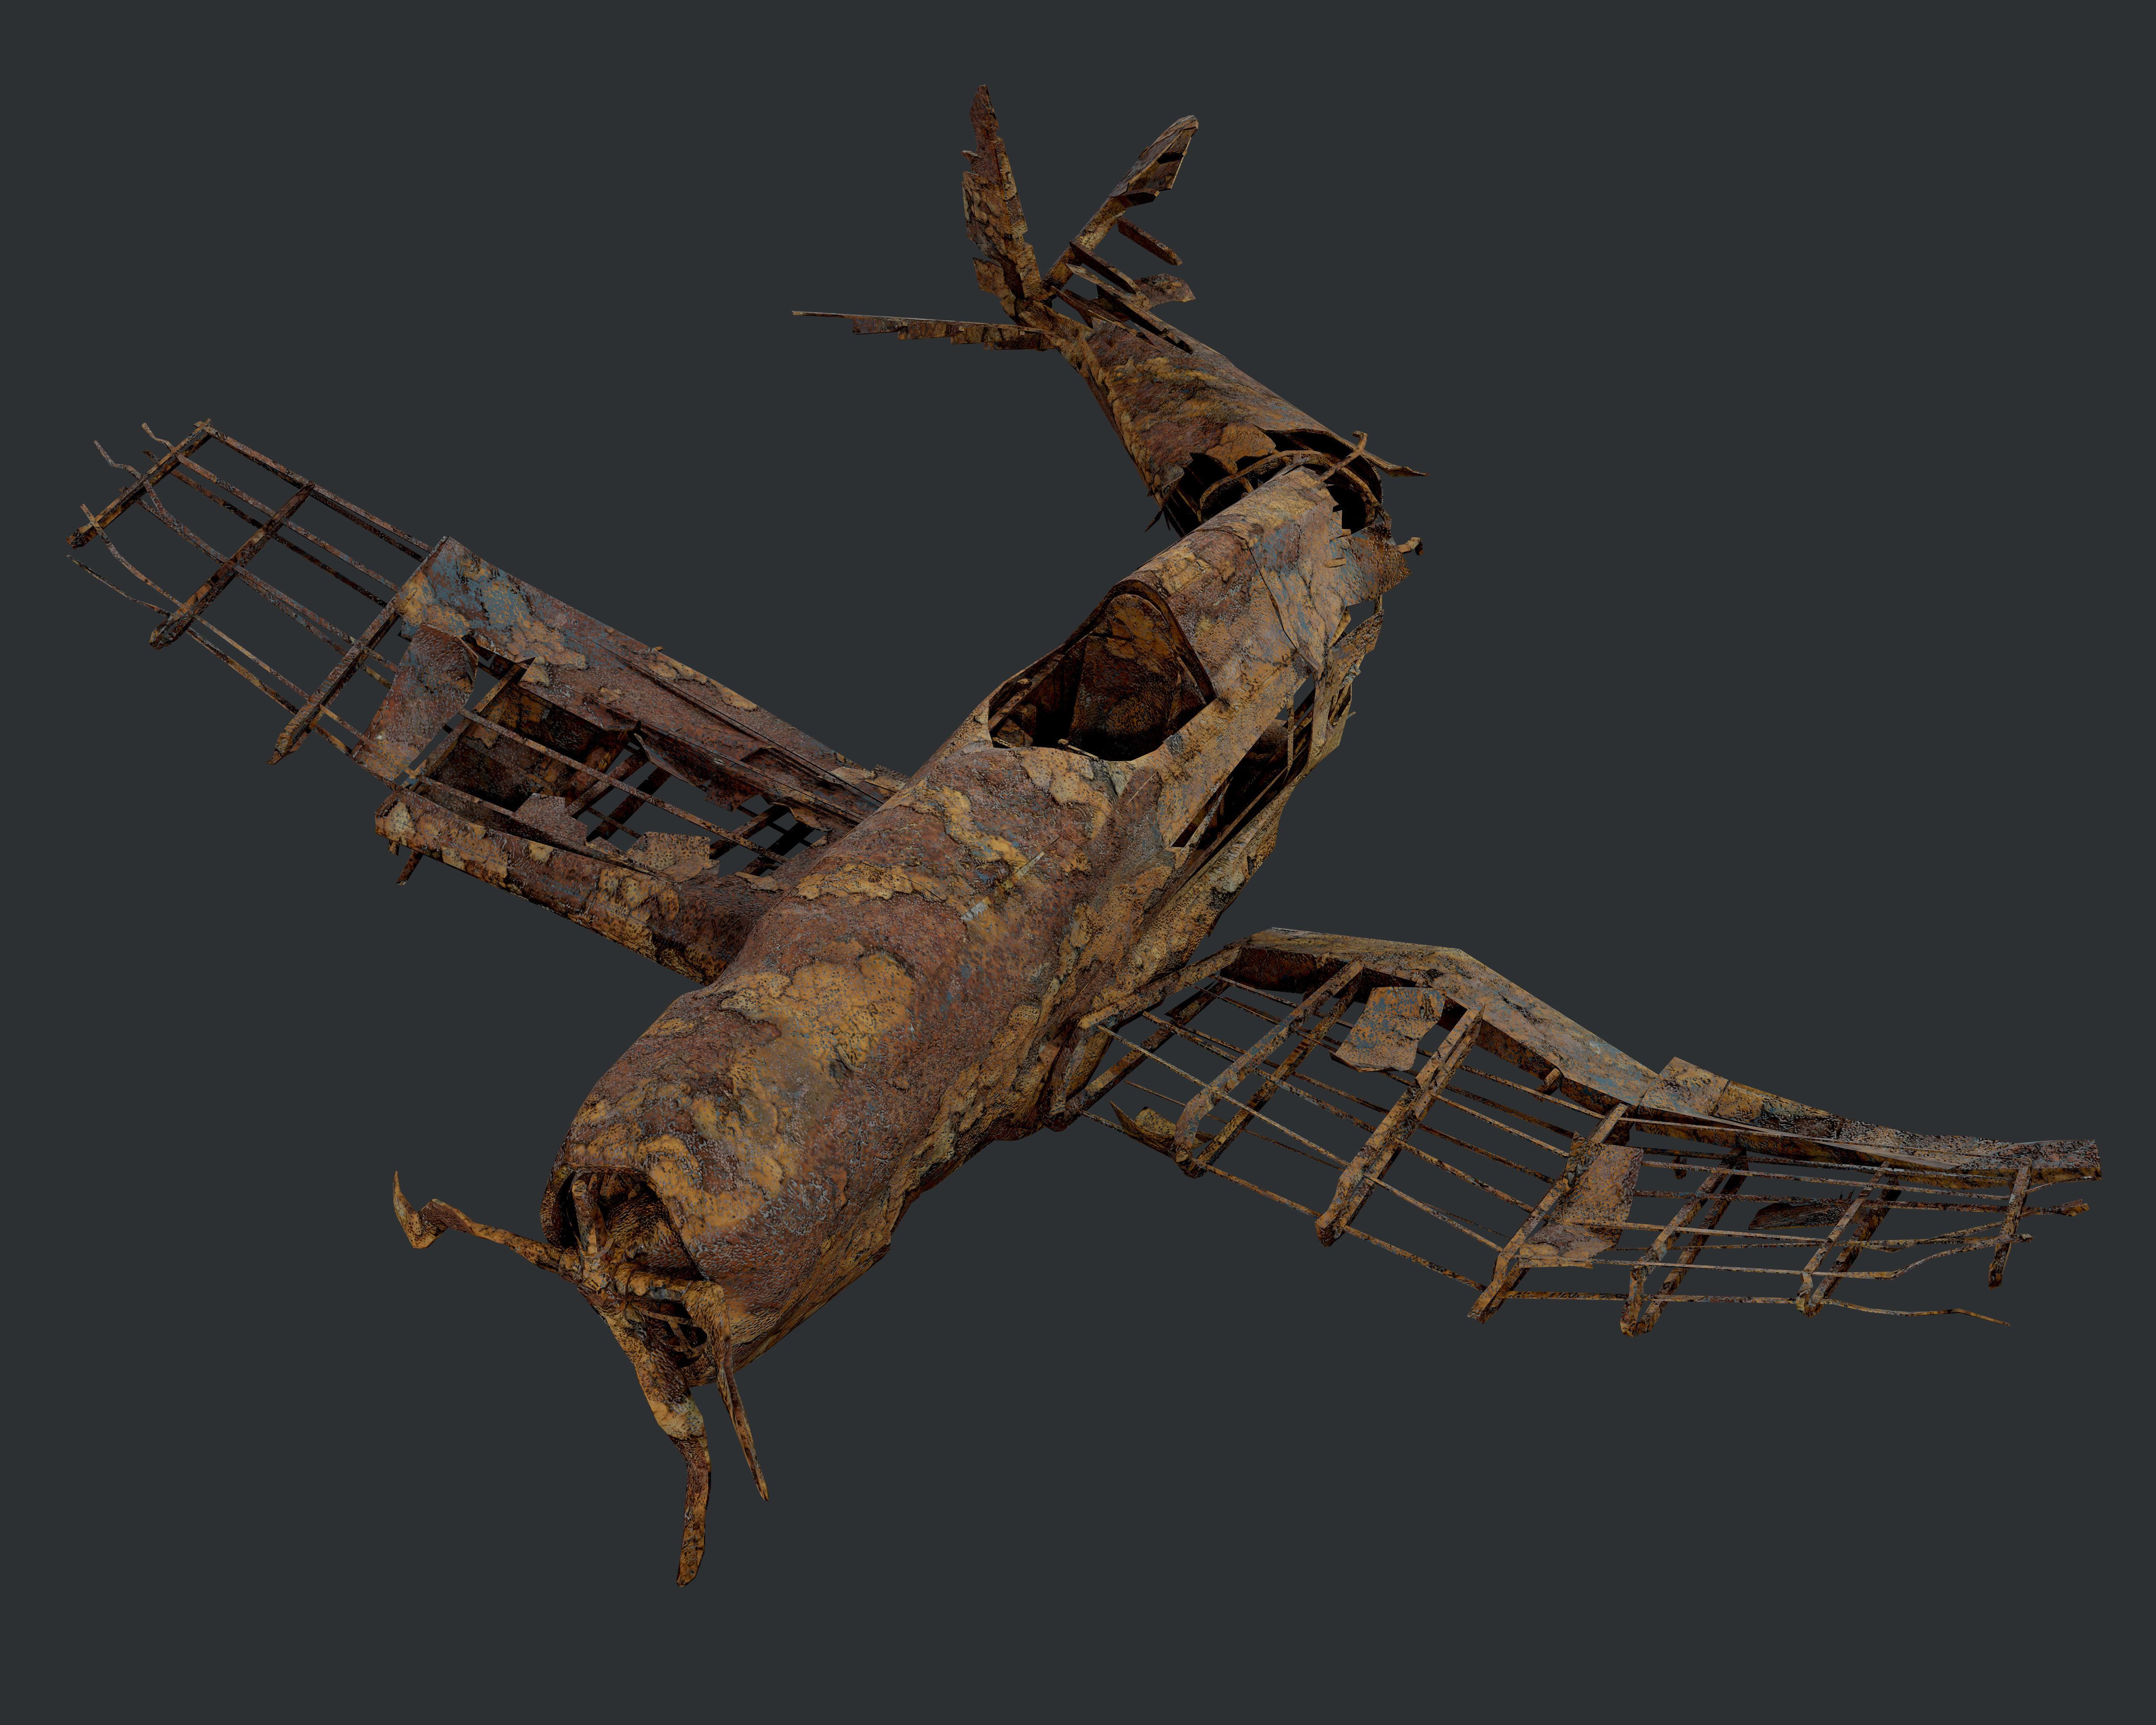 Plane Wreck Damaged Apocalyptic Game Ready 04